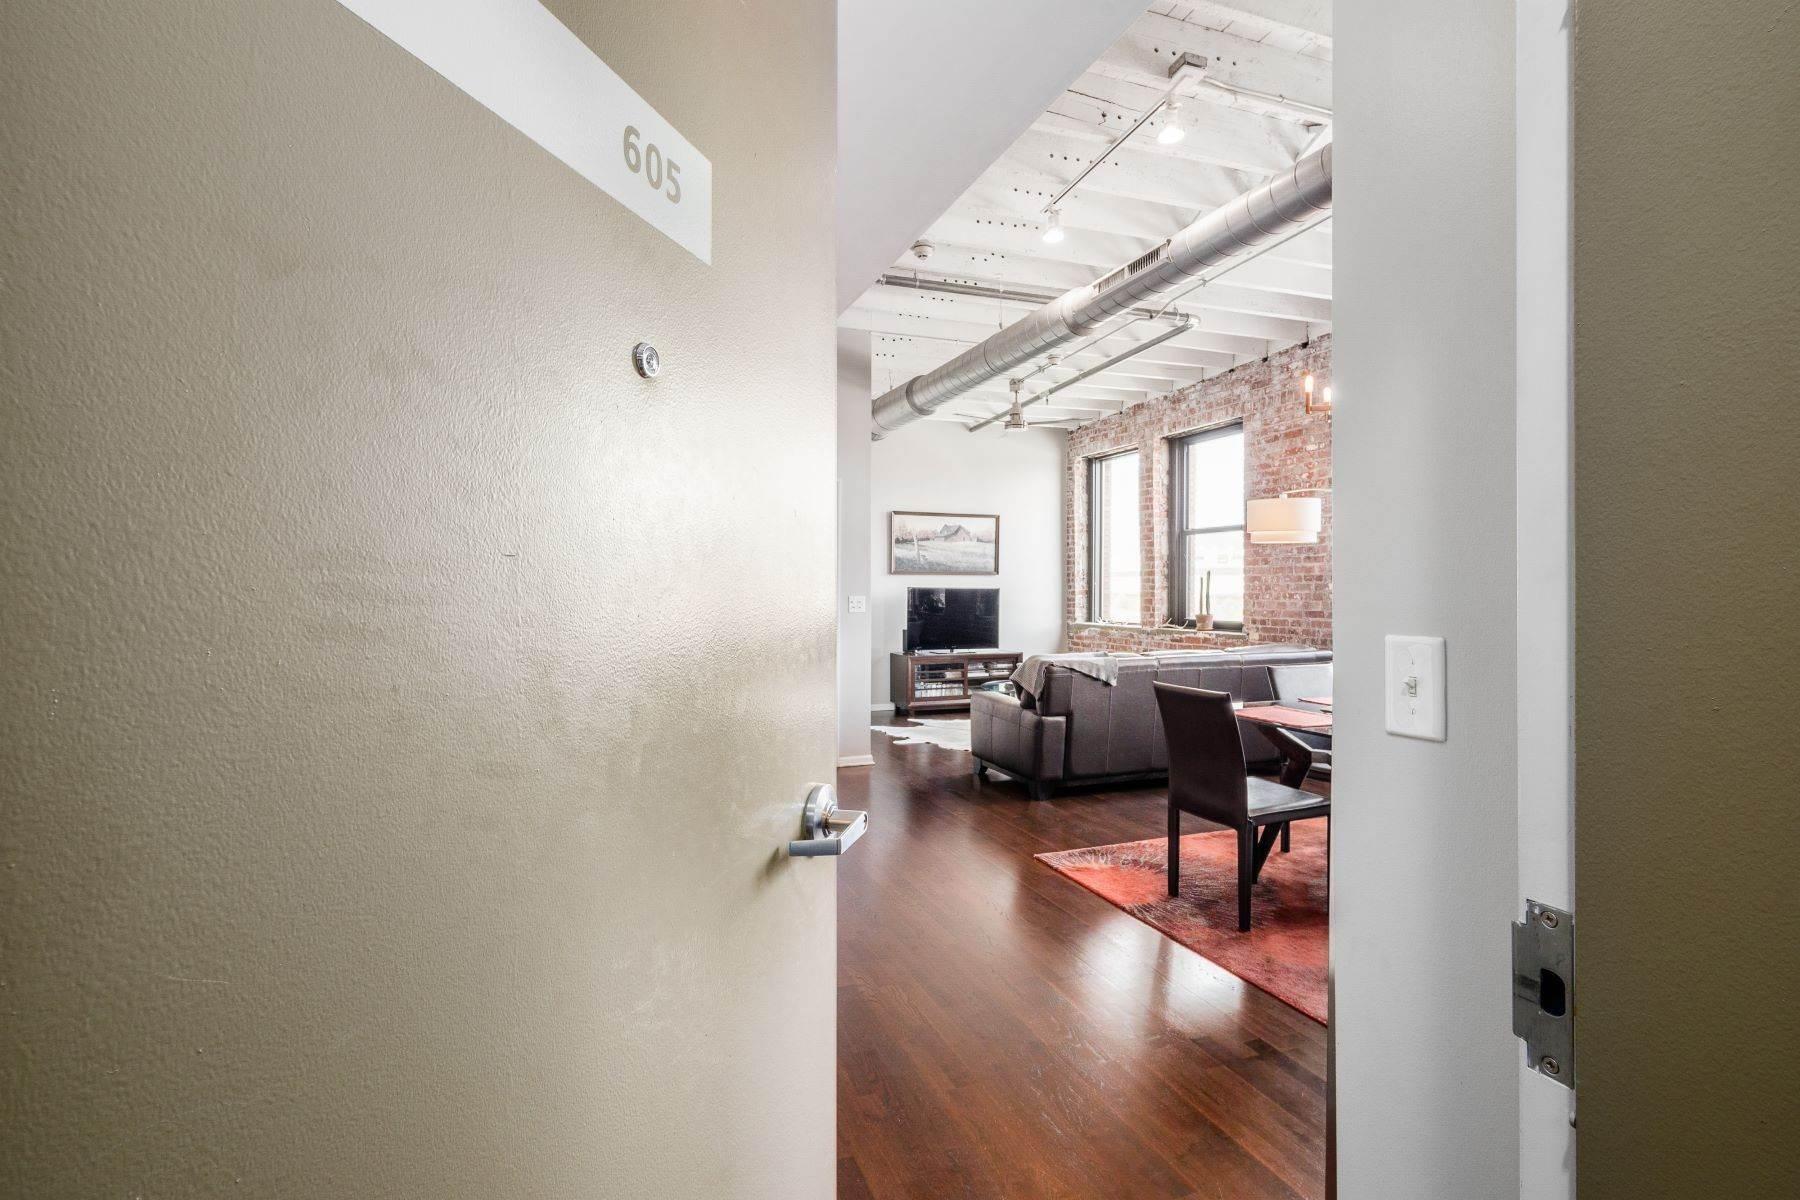 Condominiums for Sale at 78 E Chestnut Street 605 78 E Chestnut Street 605 Columbus, Ohio 43215 United States